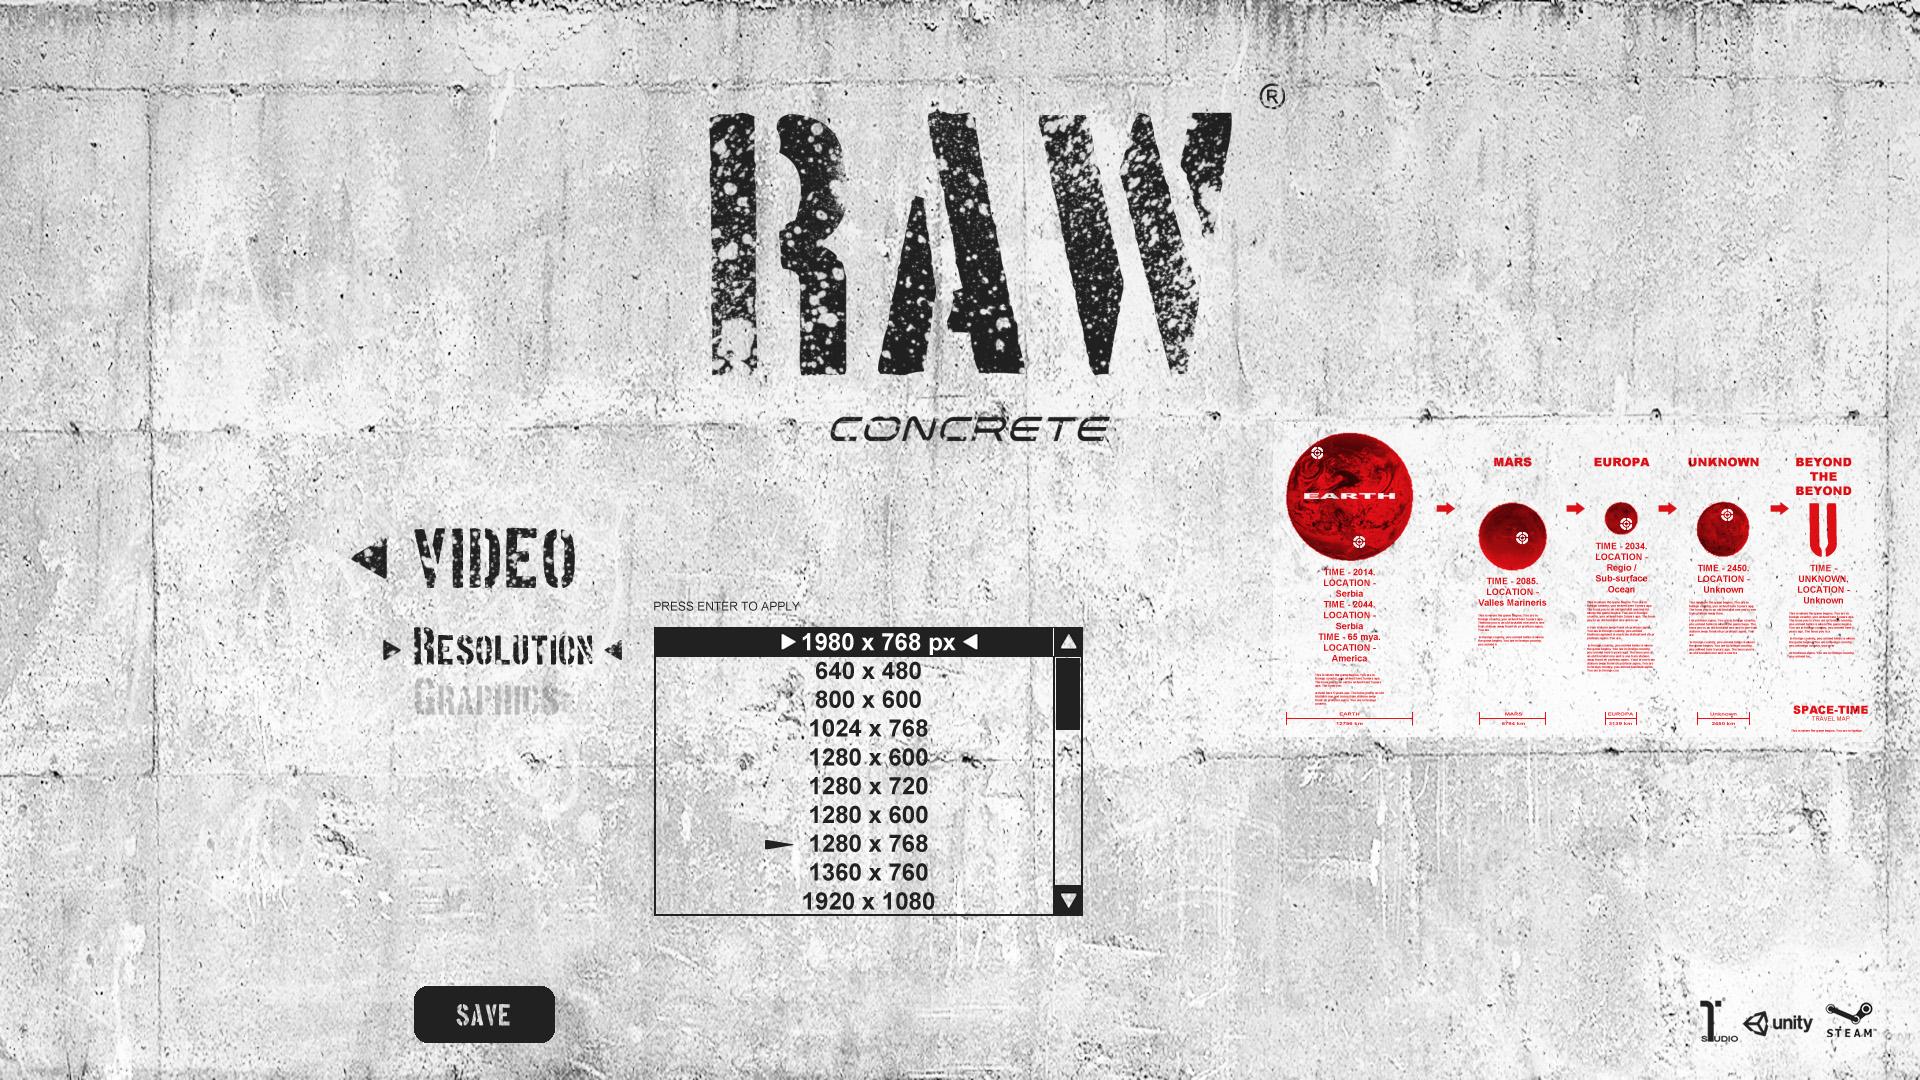 RAWconcrete2Dgame MainMenu8